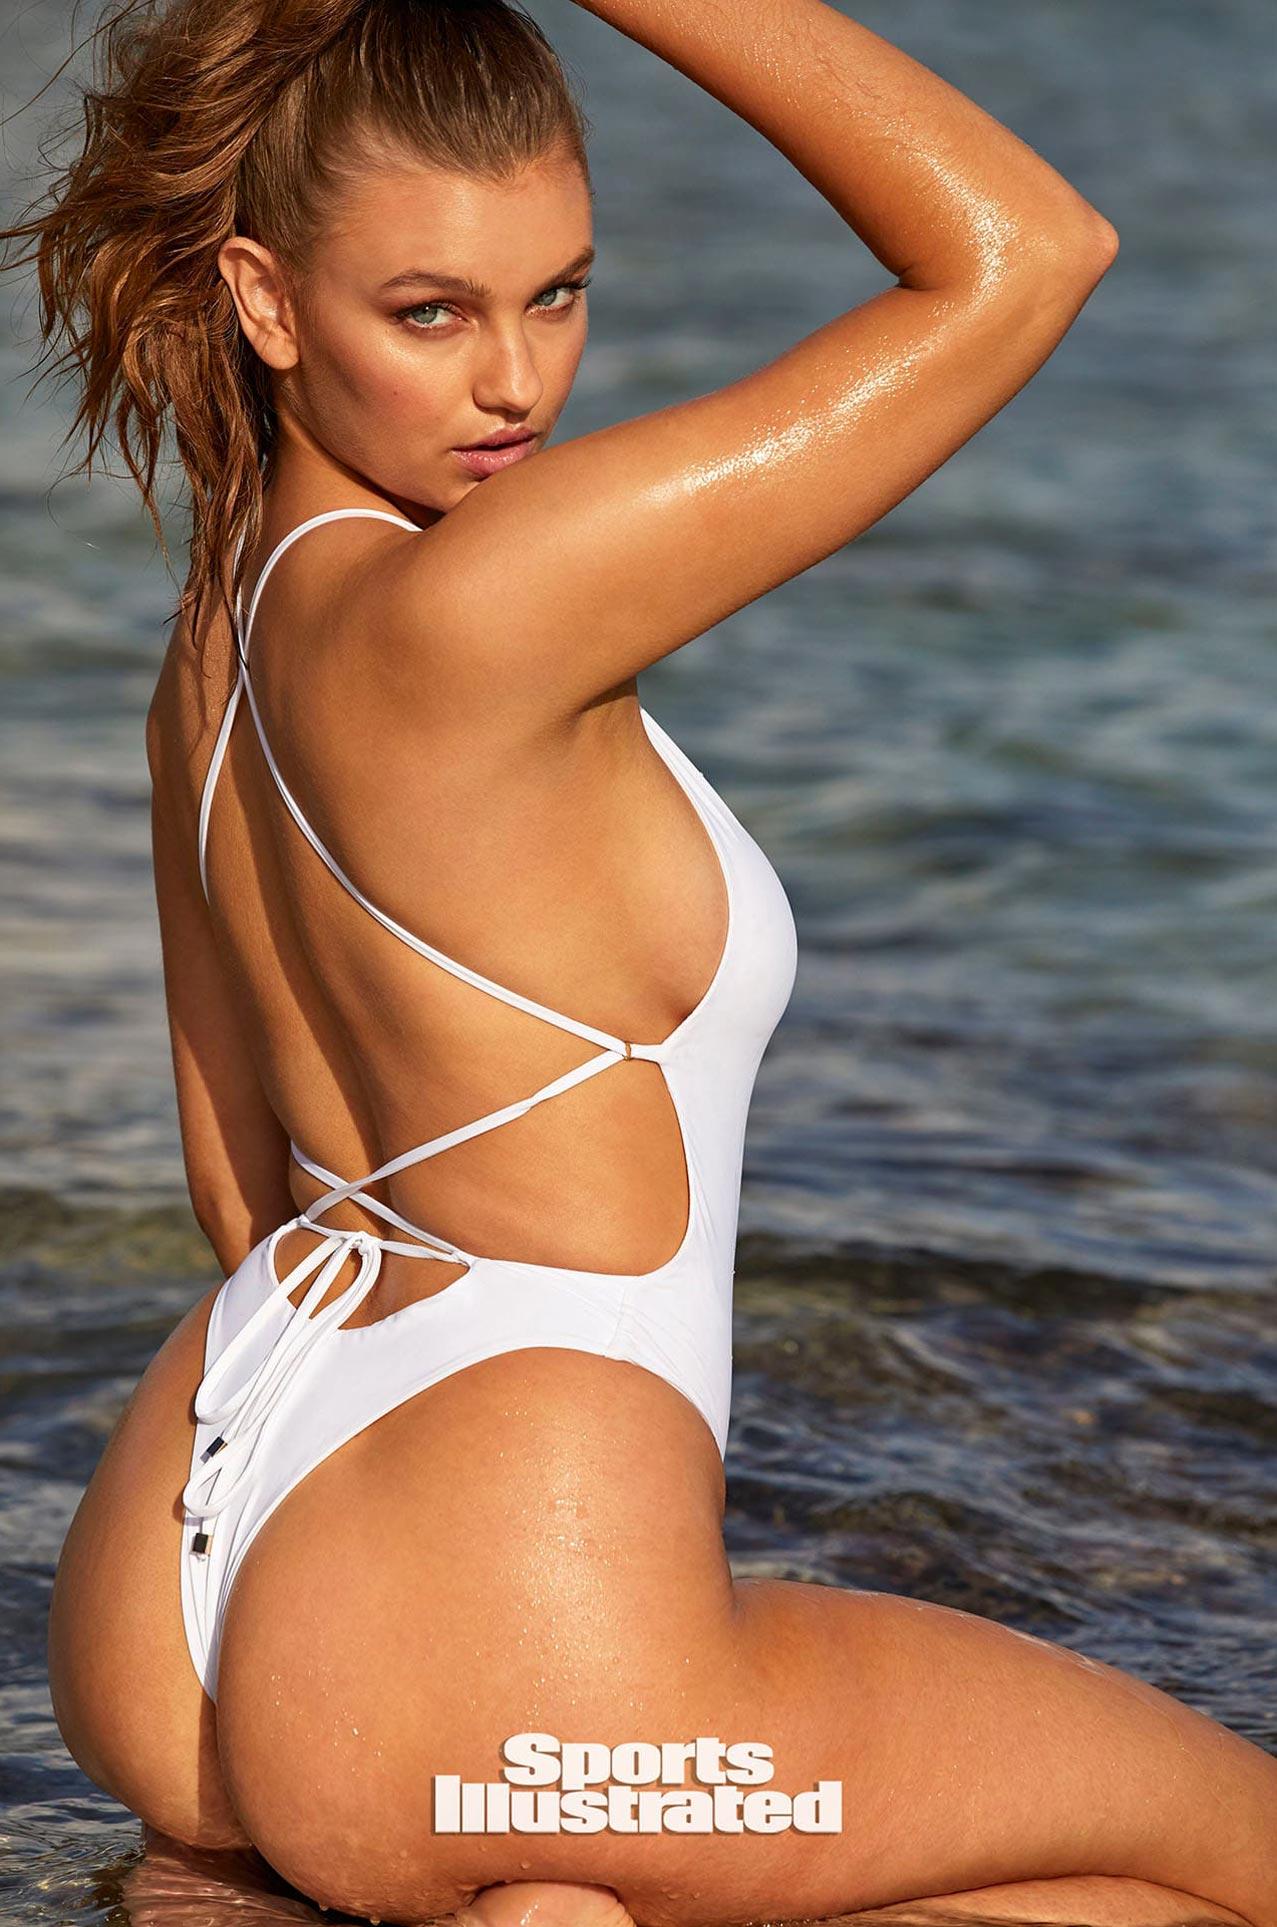 Оливия Брауэр в каталоге купальников Sports Illustrated Swimsuit 2020 / фото 21